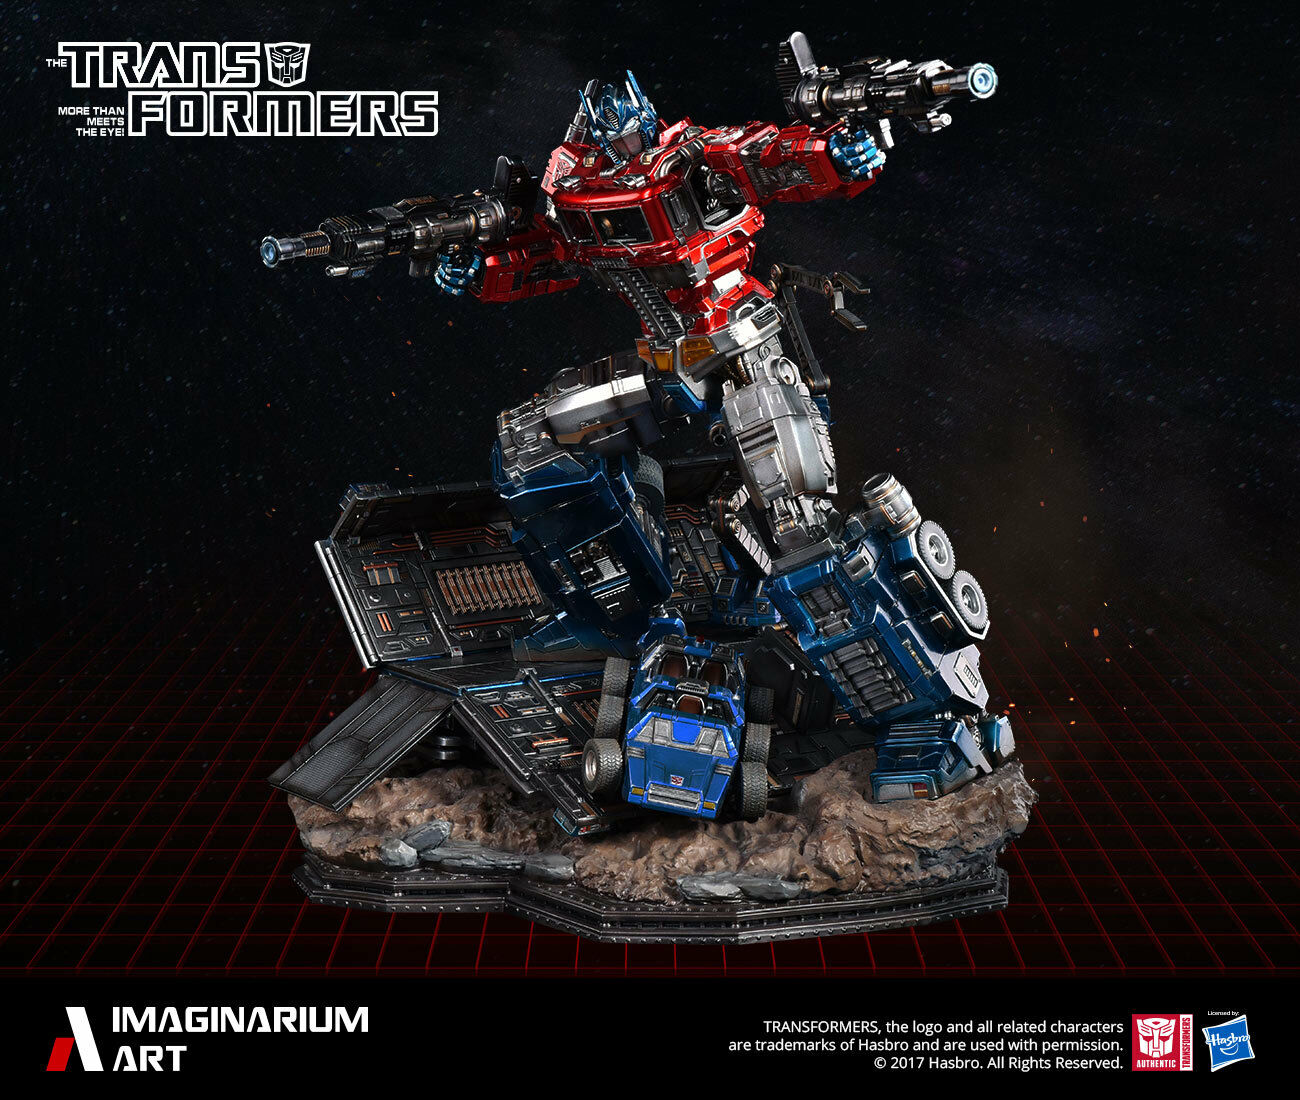 Transformers Generation G1 Optimus Prime Limitierte Auflage Statue